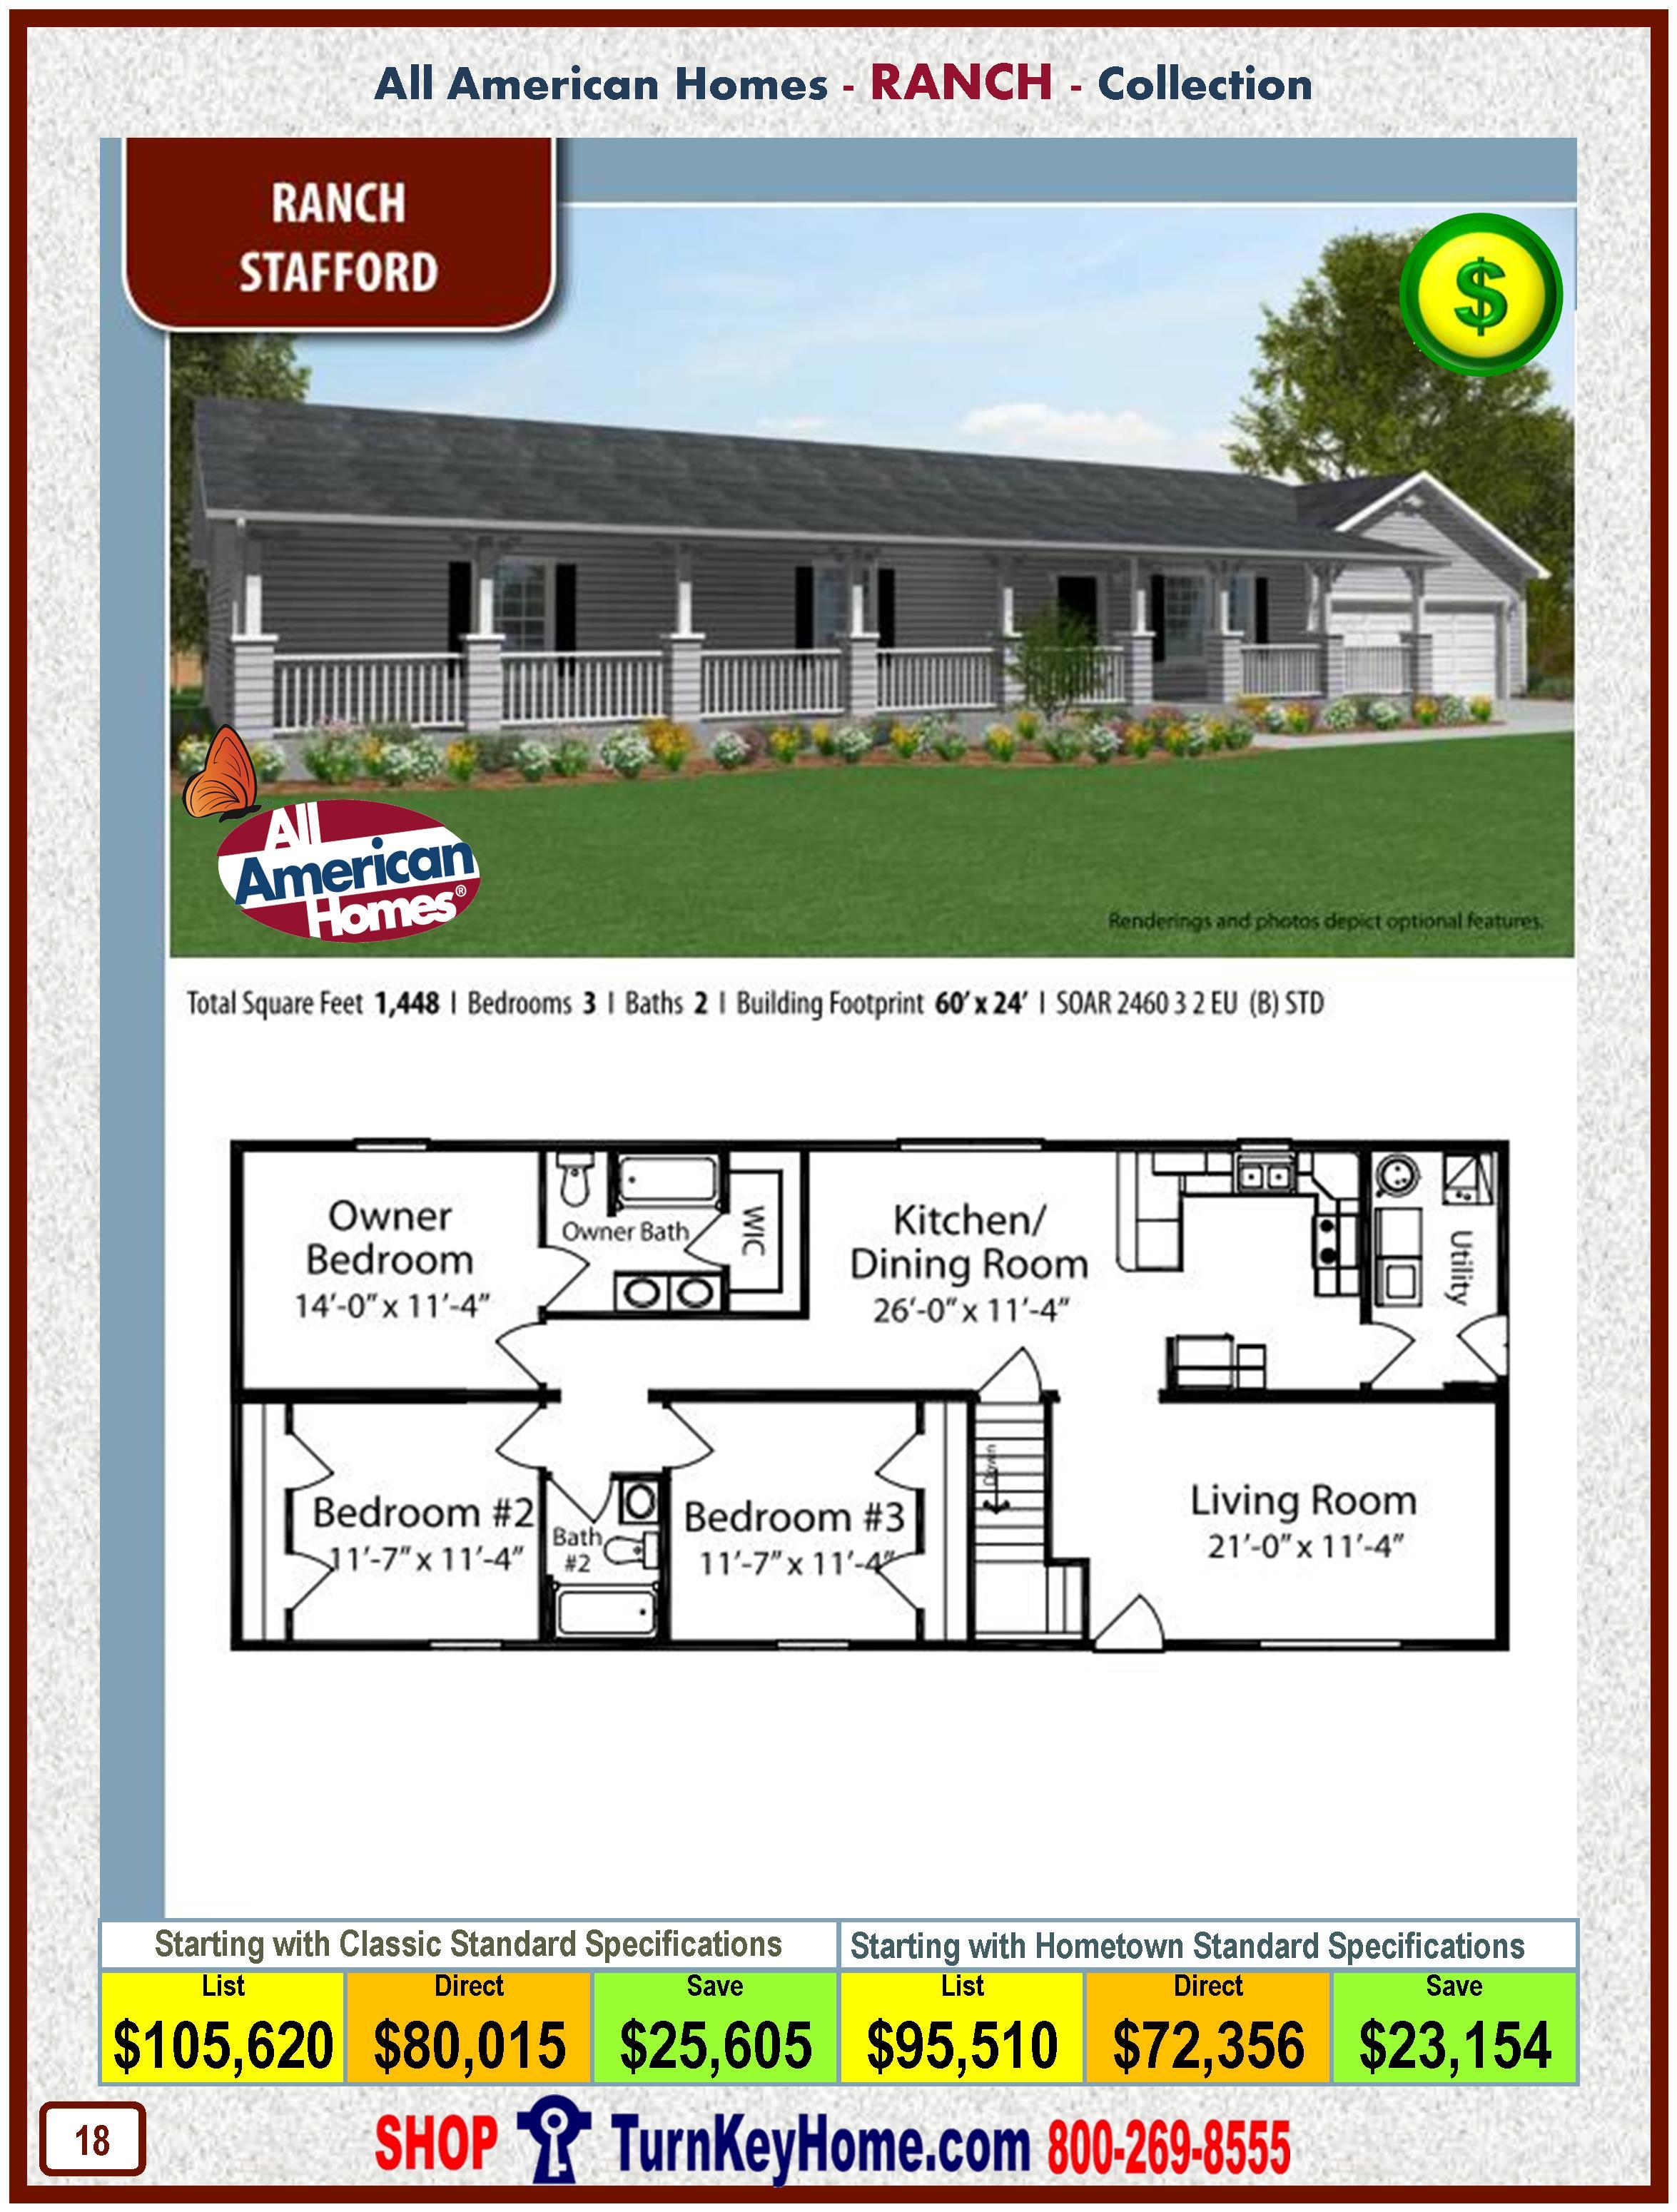 Price Modular Homes stafford all american modular home ranch collection plan price